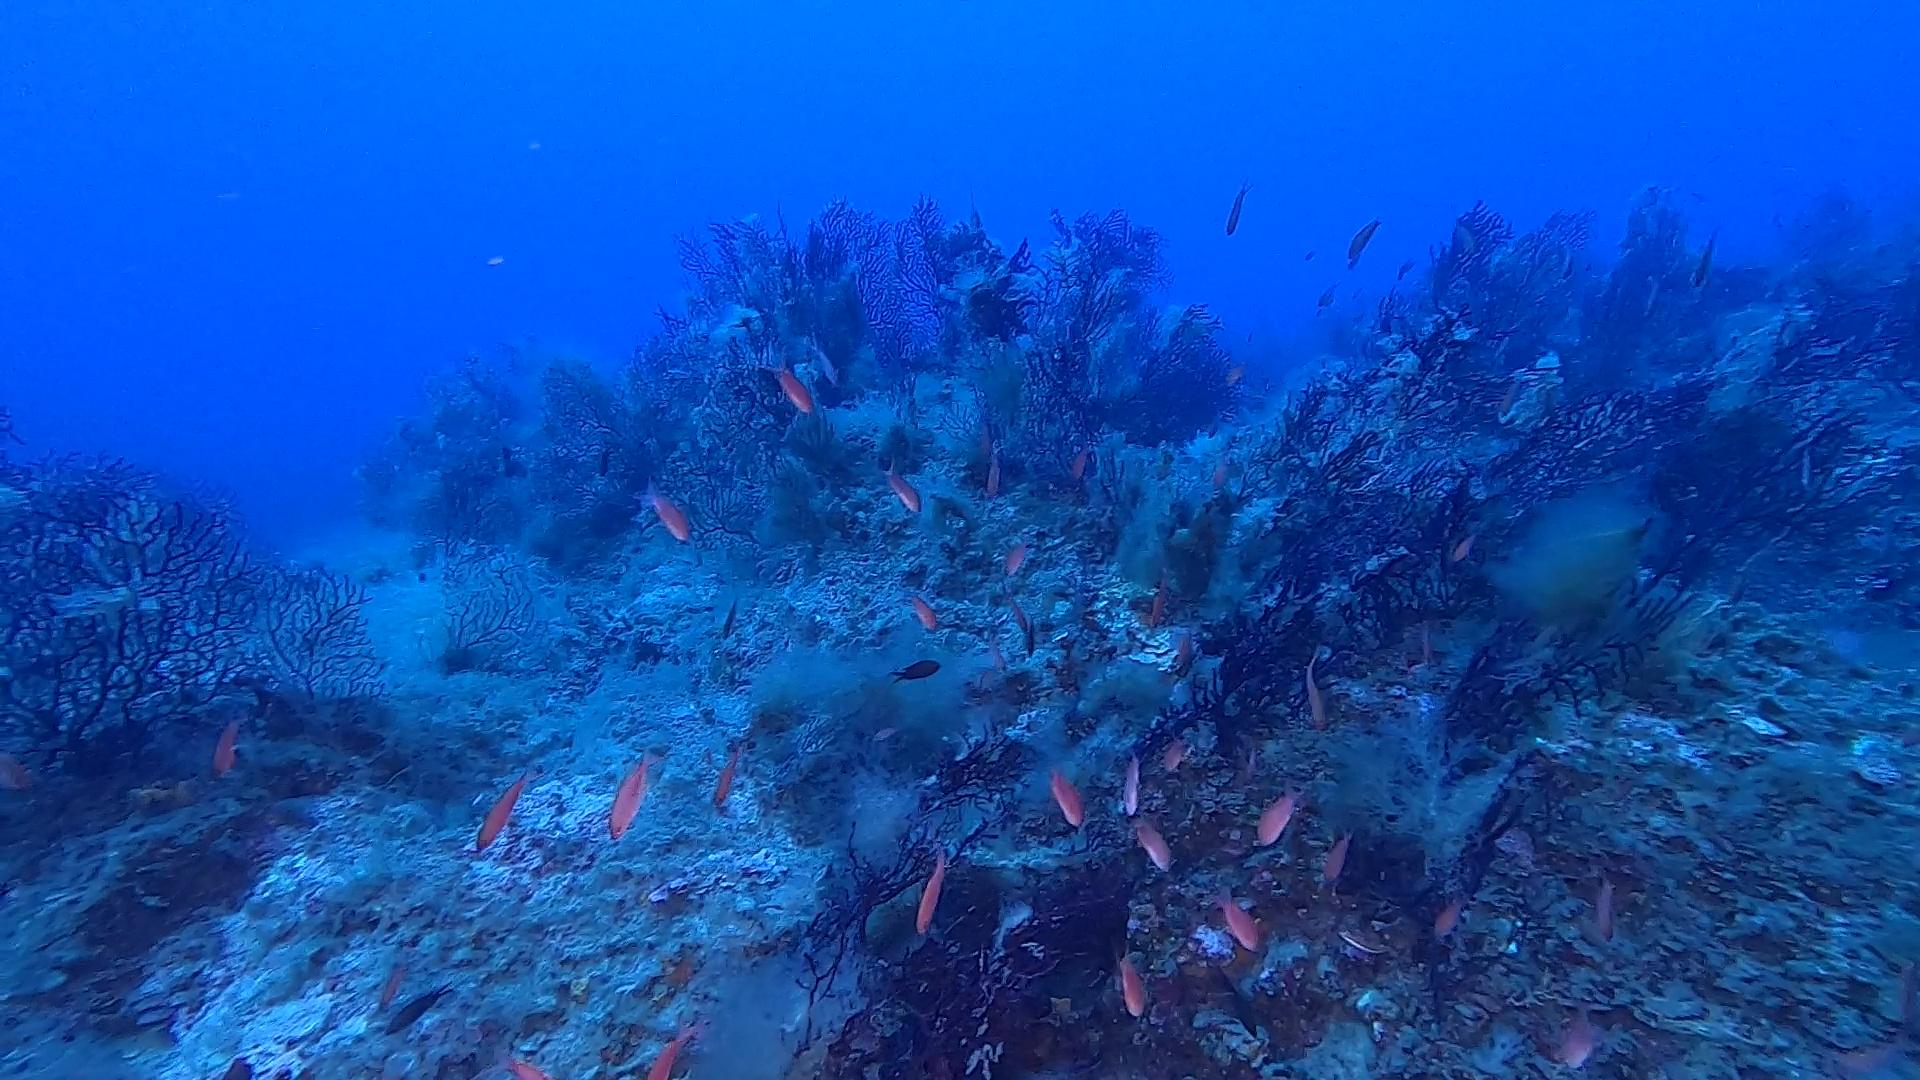 Missing Island L'Isola mancata www.intotheblue.it